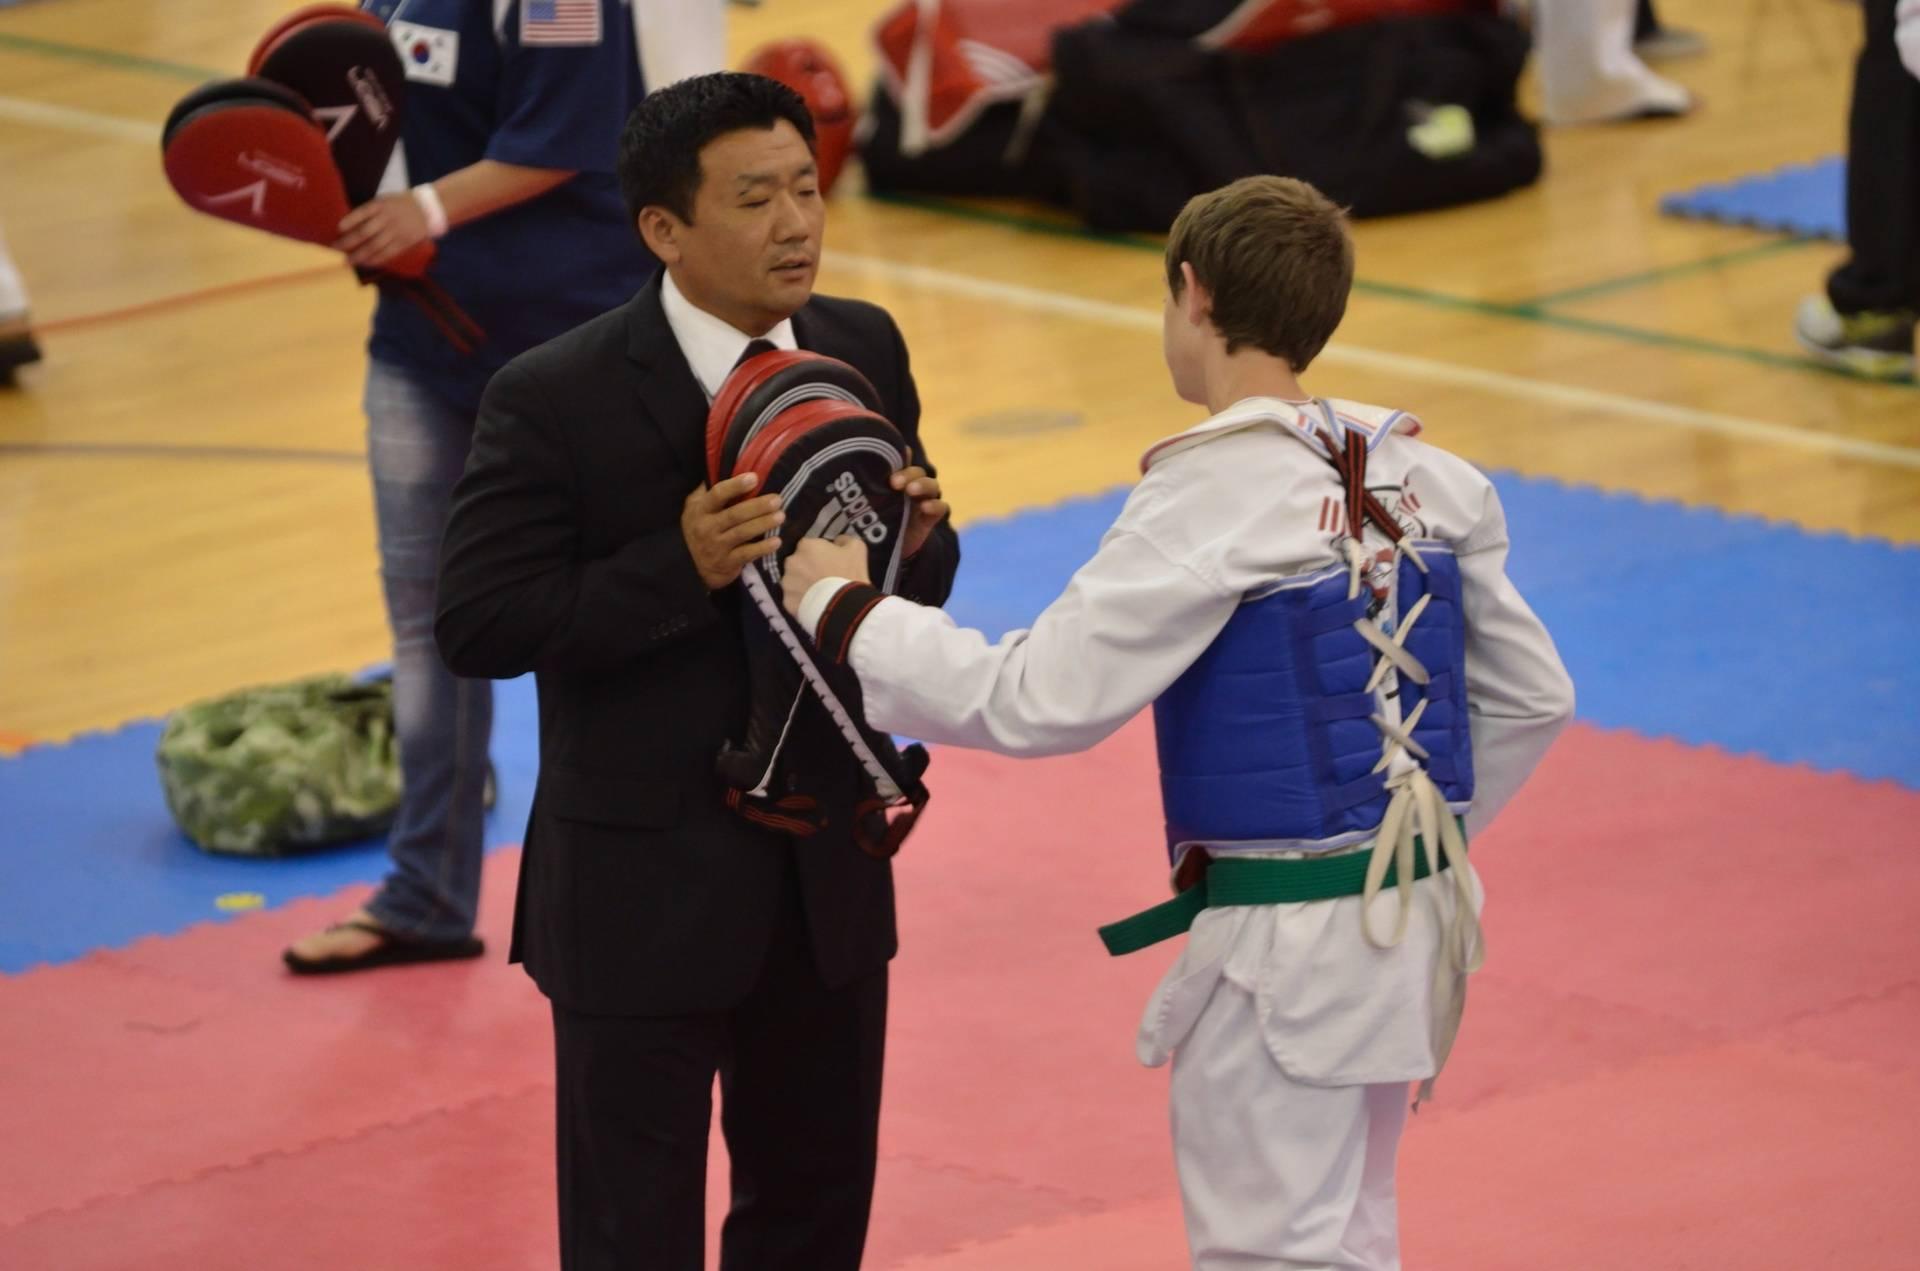 Master Choe and Jake